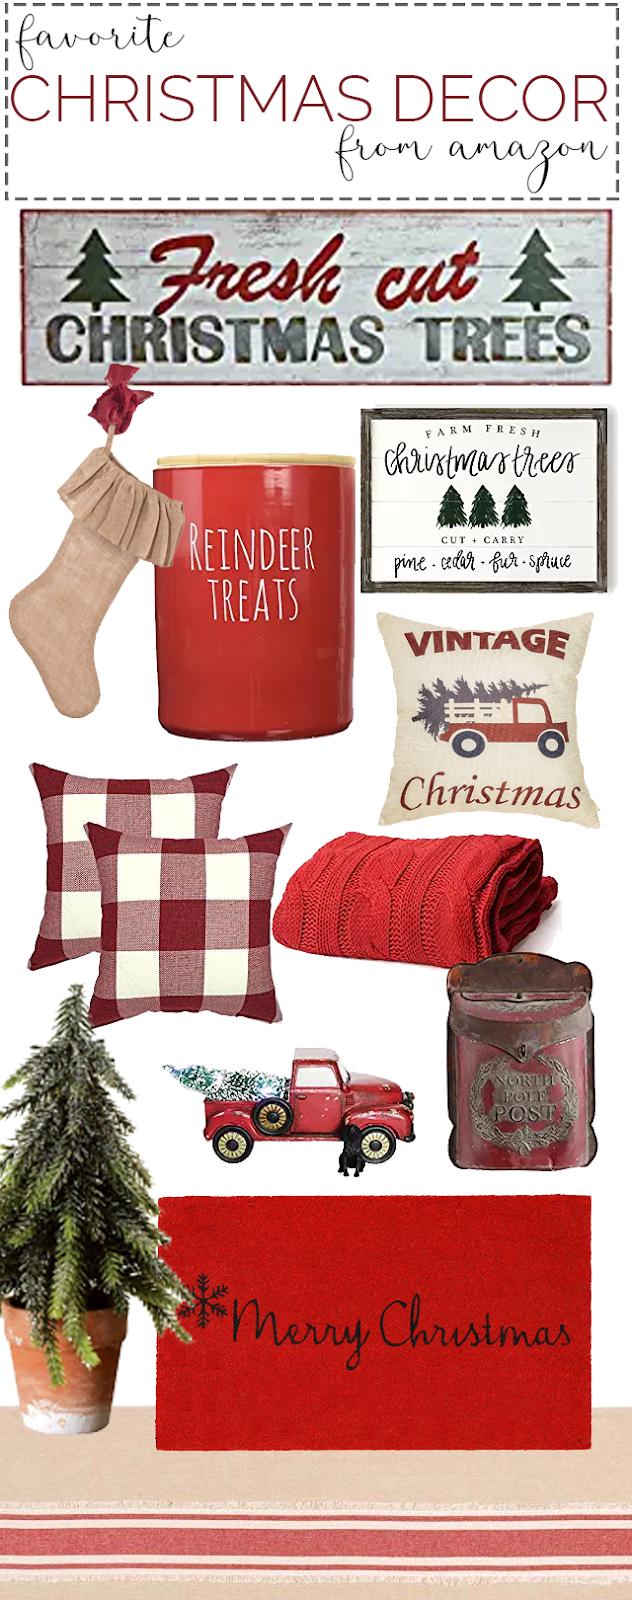 Christmas Decor From Amazon Favorite Christmas Decor Christmas Decorating Ideas Red Chri In 2020 Red Christmas Decor Christmas Decorations Farmhouse Style Christmas